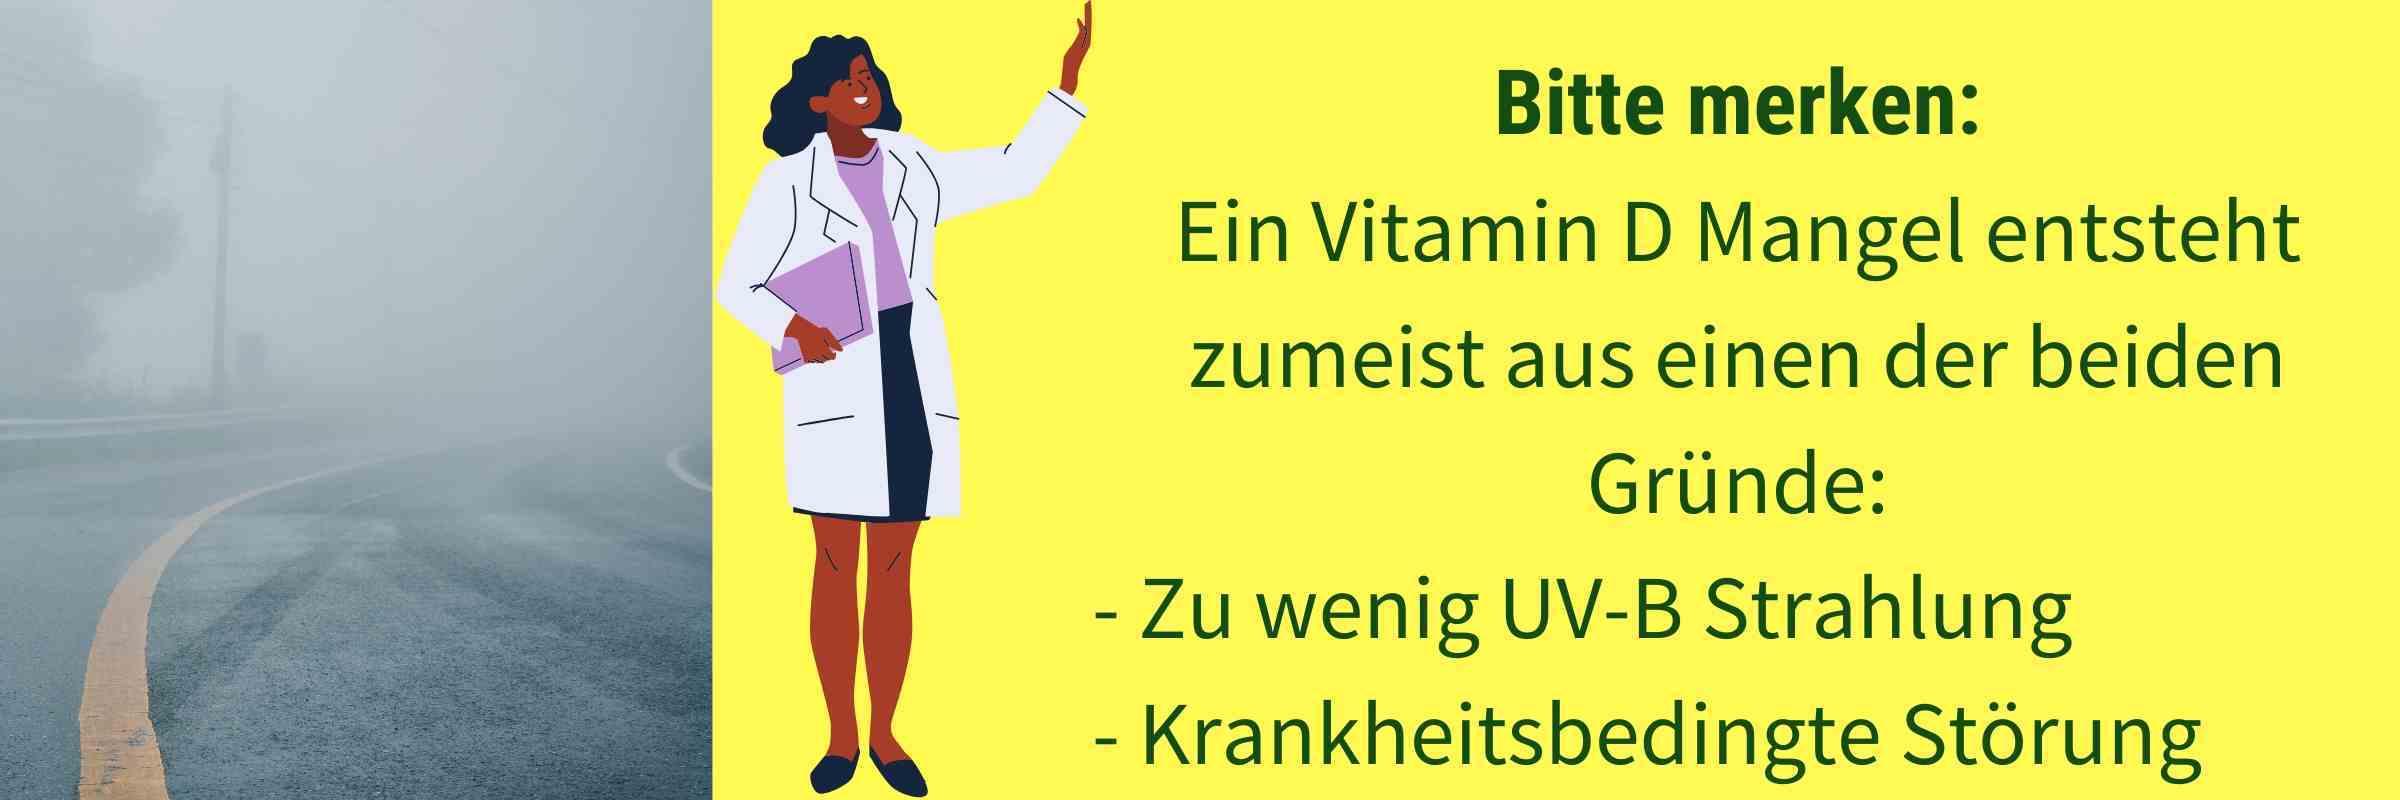 Ursache Vitamin D Mangel